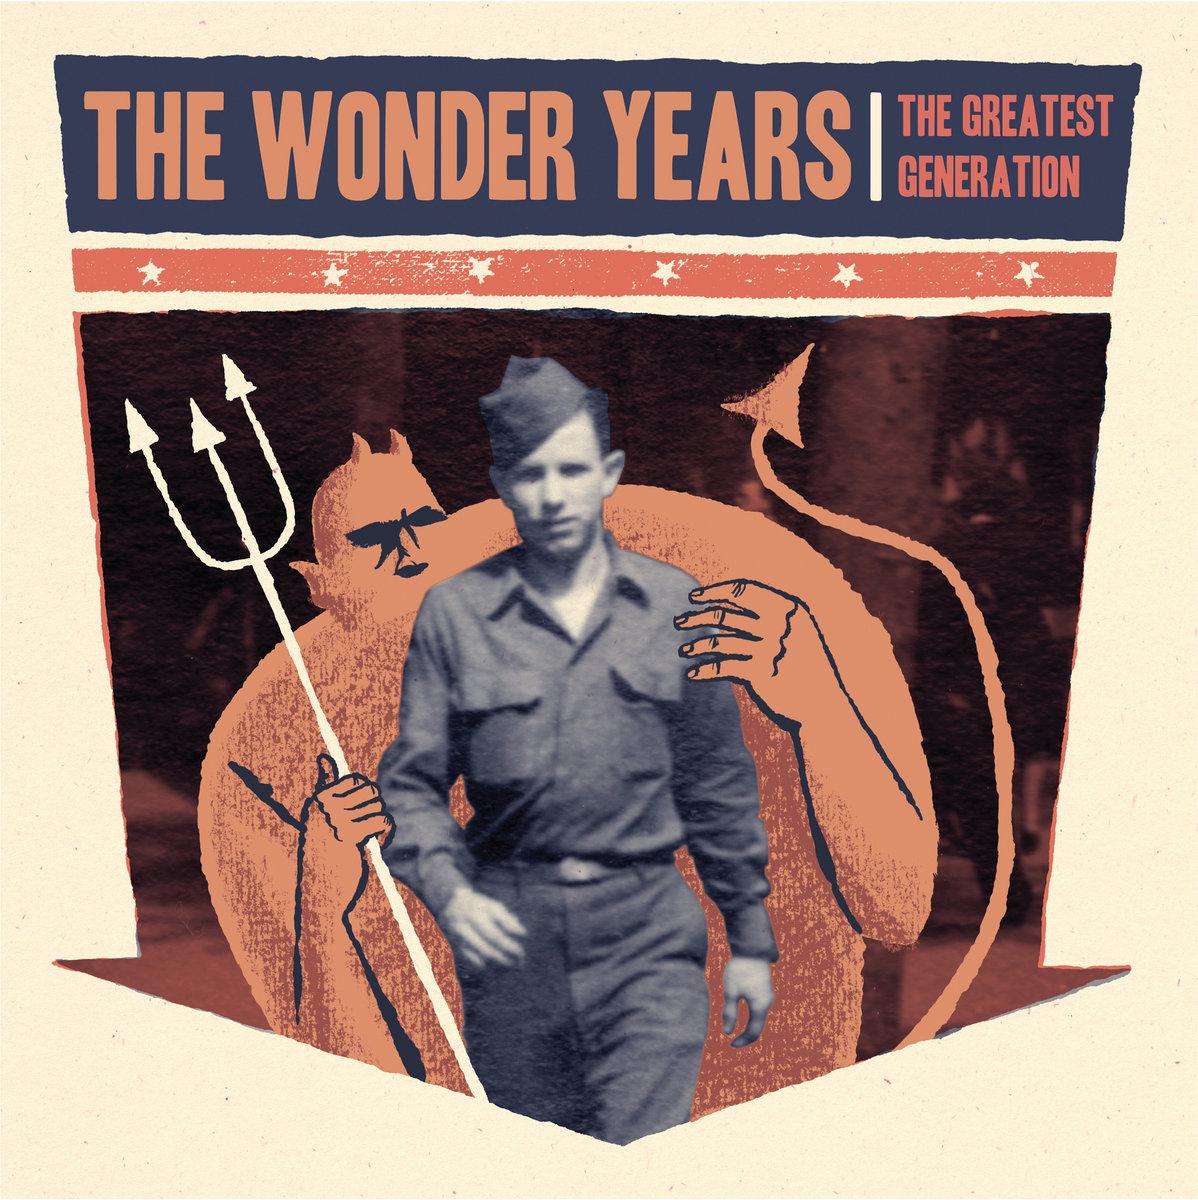 Passing Through A Screen Door The Wonder Years